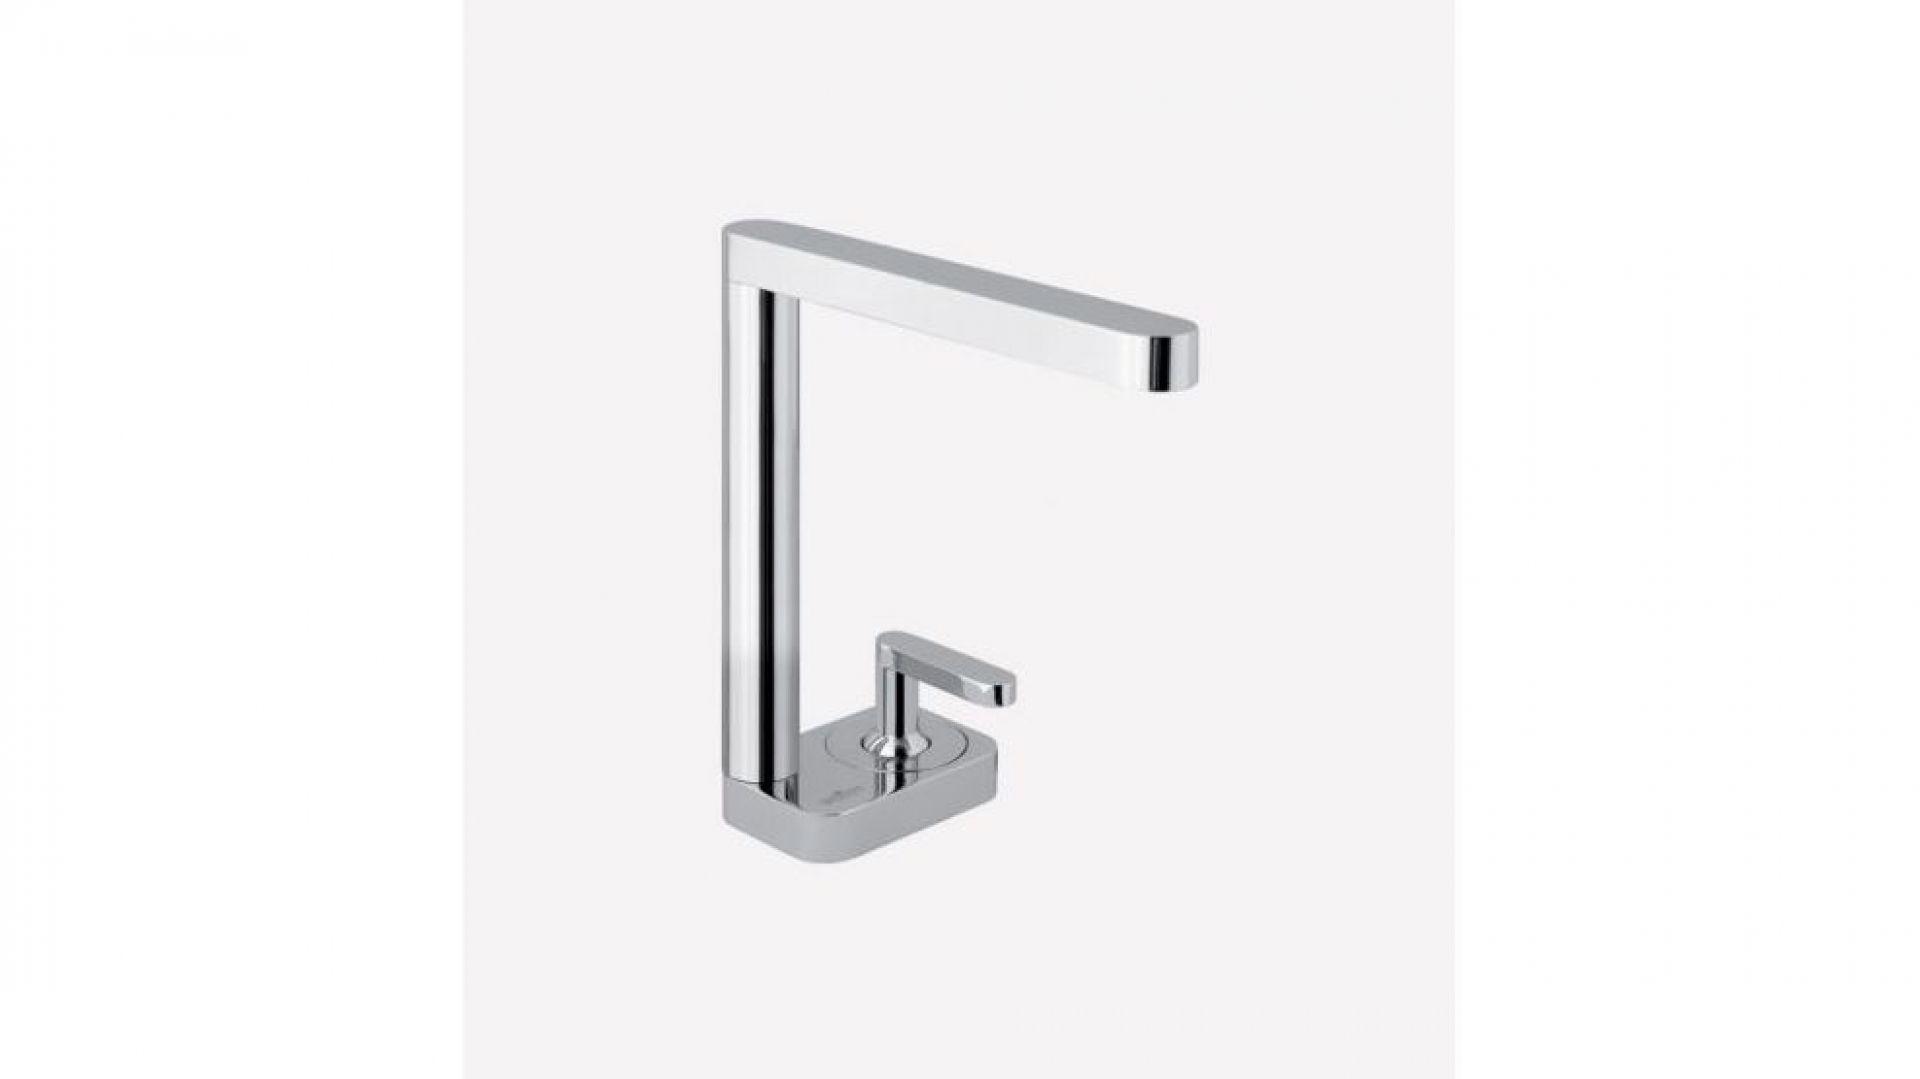 Seria Livorno/J&E Projekt. Produkt zgłoszony do konkursu Dobry Design 2019.